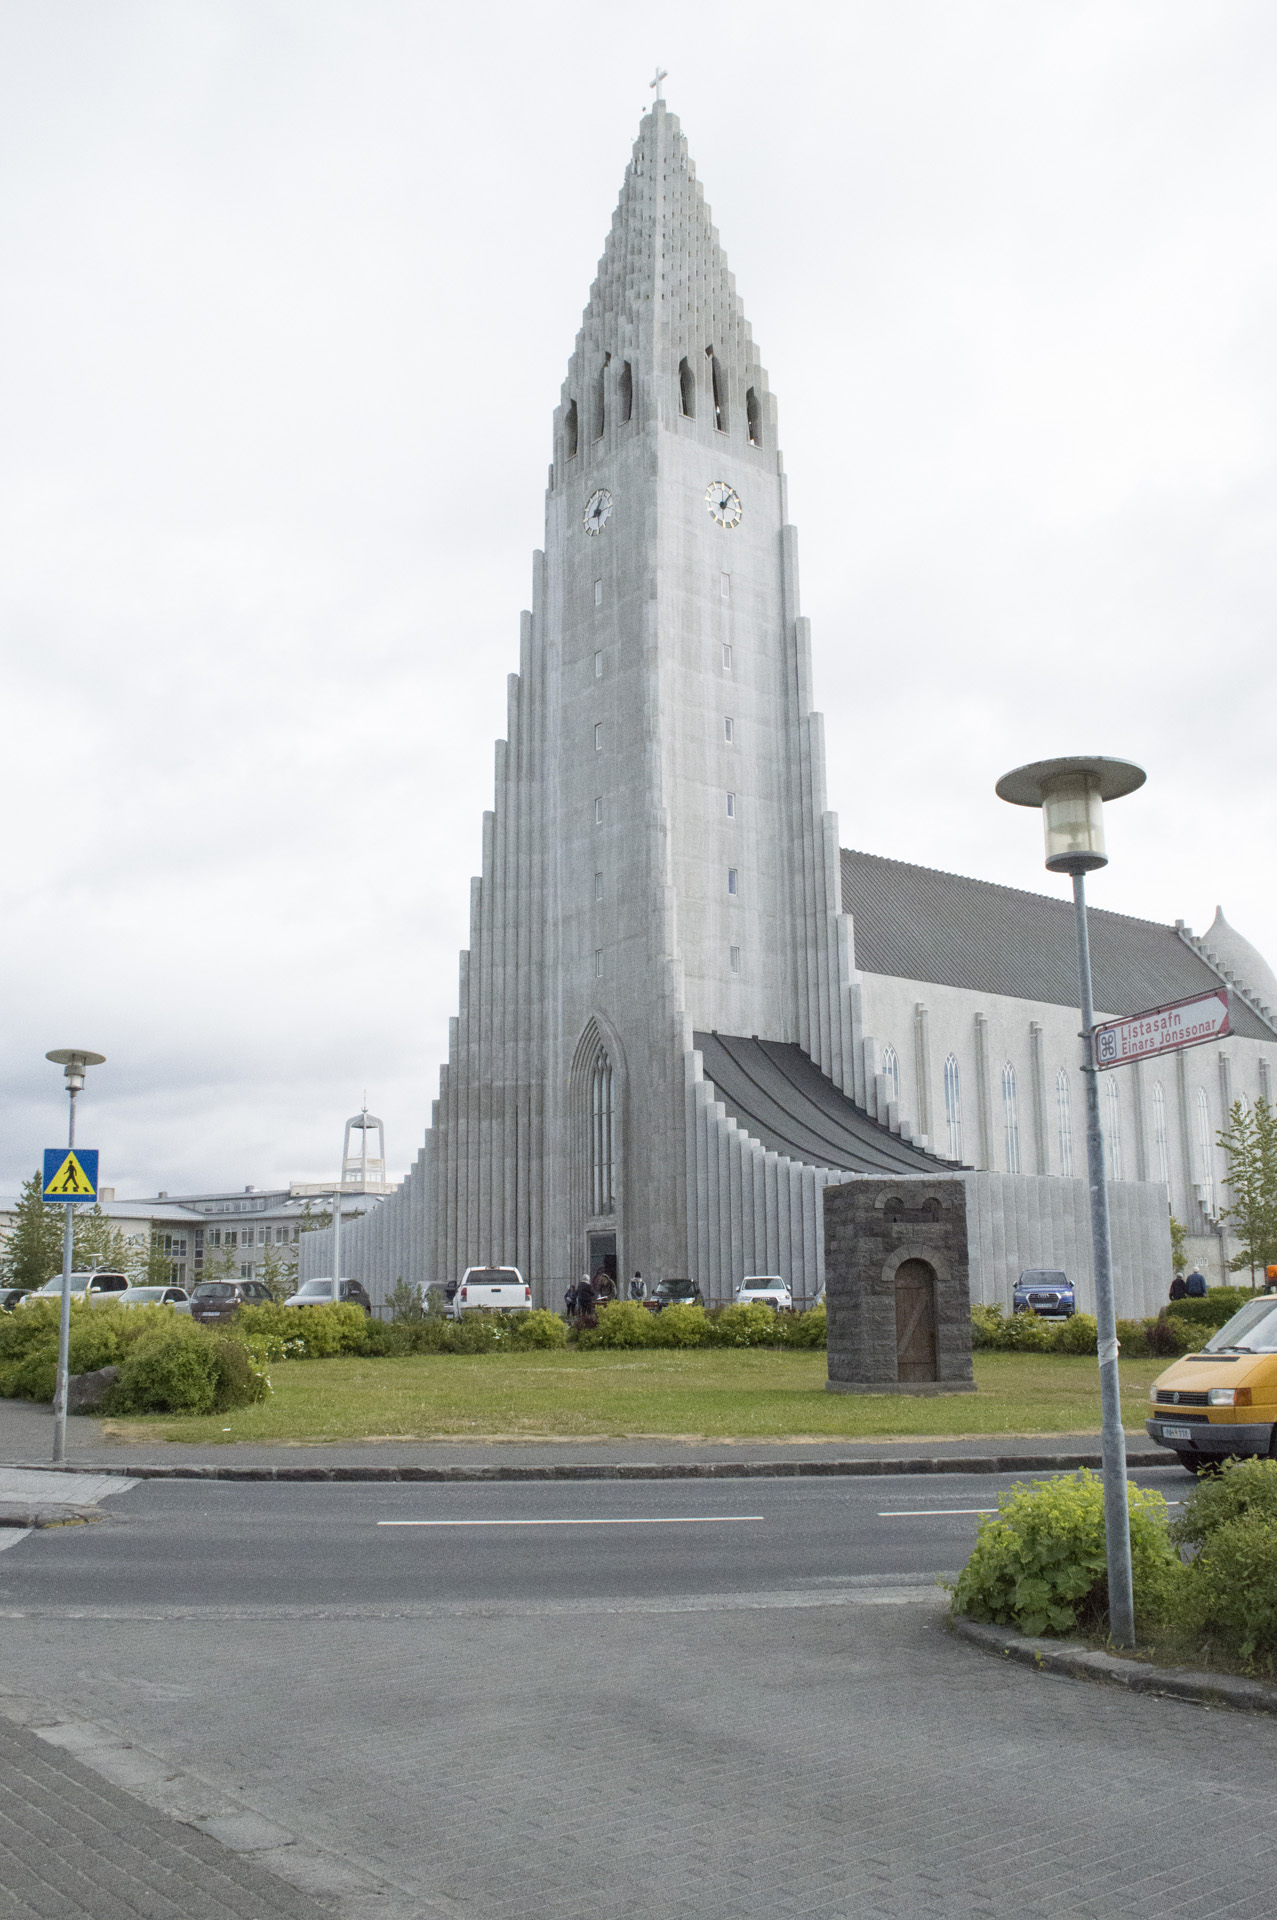 Hallgrímskirkja, Reykjavík, Iceland. The church is the second-tallest building in Iceland.